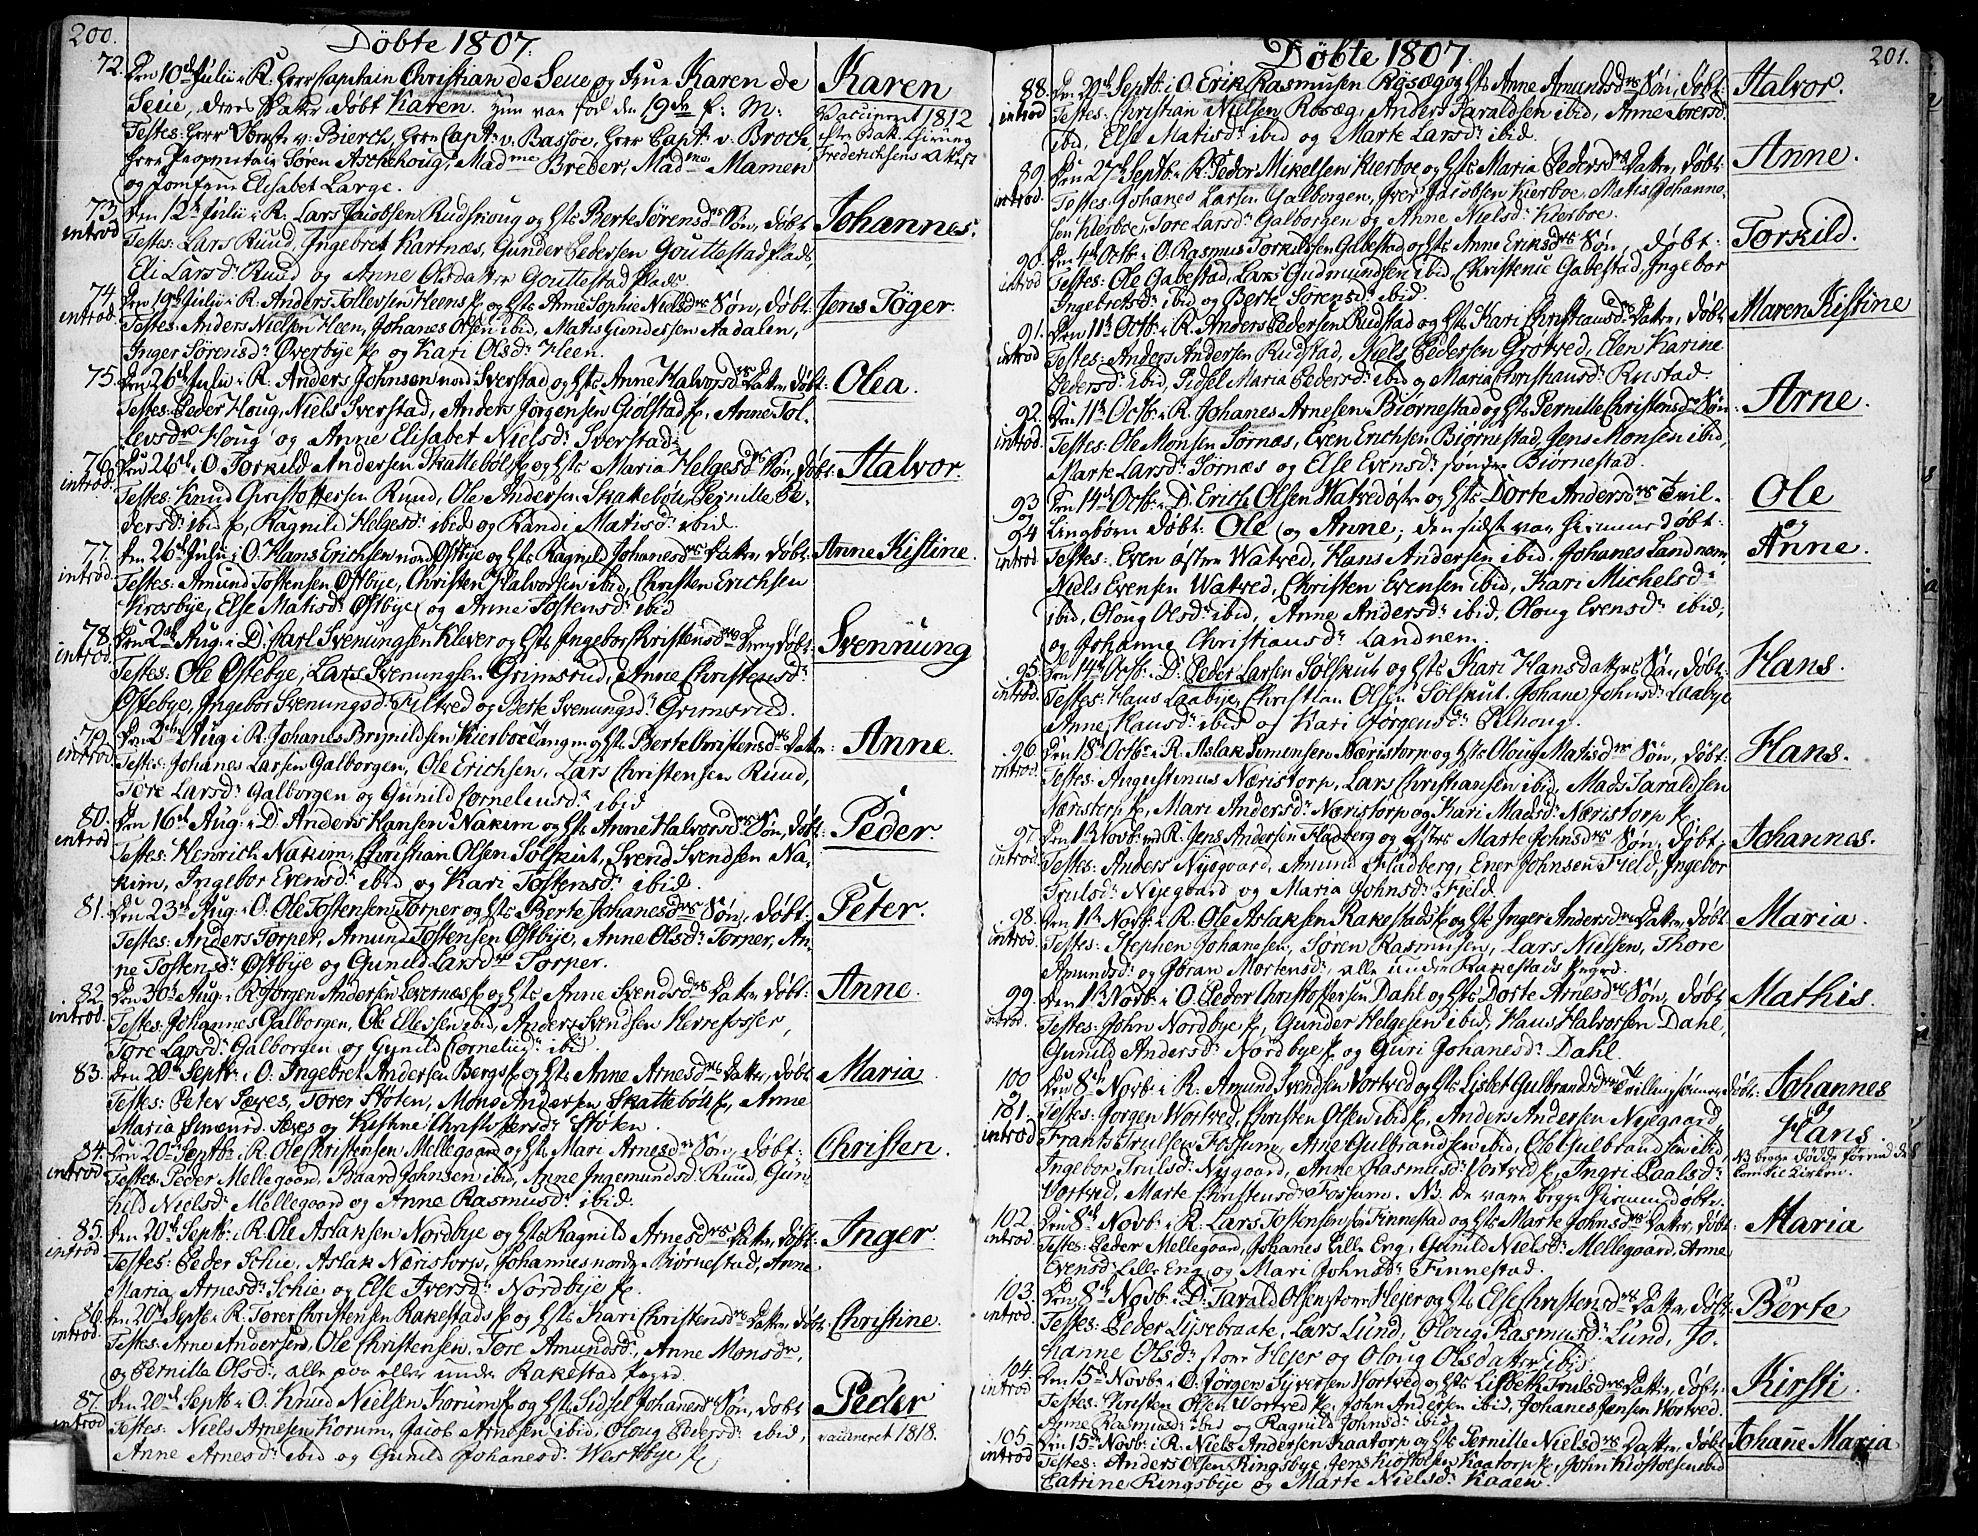 SAO, Rakkestad prestekontor Kirkebøker, F/Fa/L0005: Ministerialbok nr. I 5, 1784-1814, s. 200-201